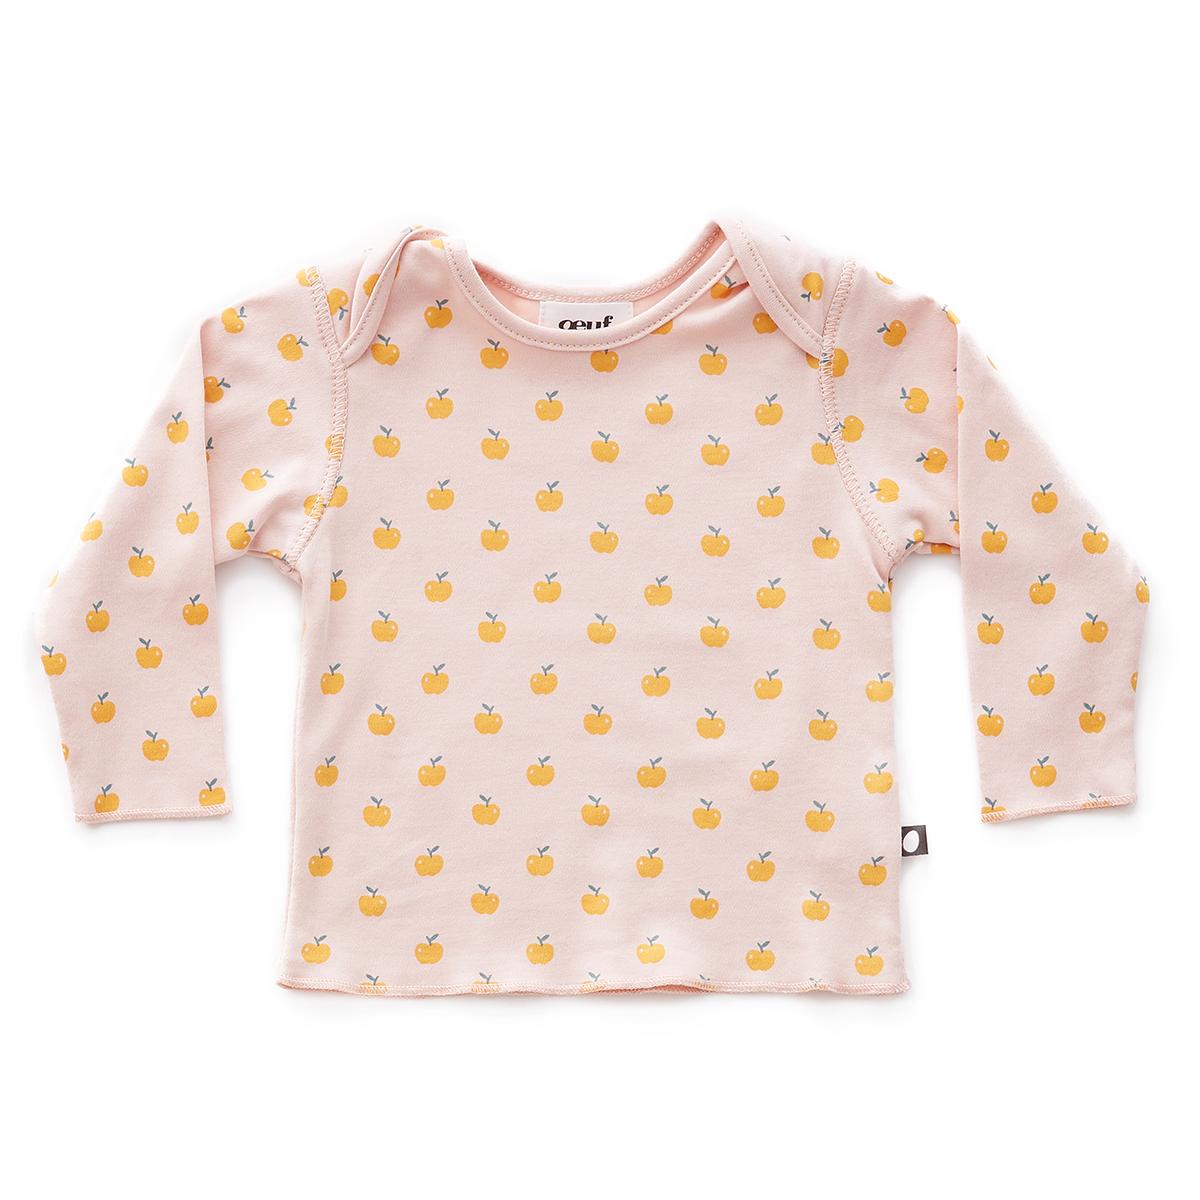 Haut bébé Tee-shirt Pommes Rose - 2 Ans Tee-shirt Pommes Rose - 2 Ans